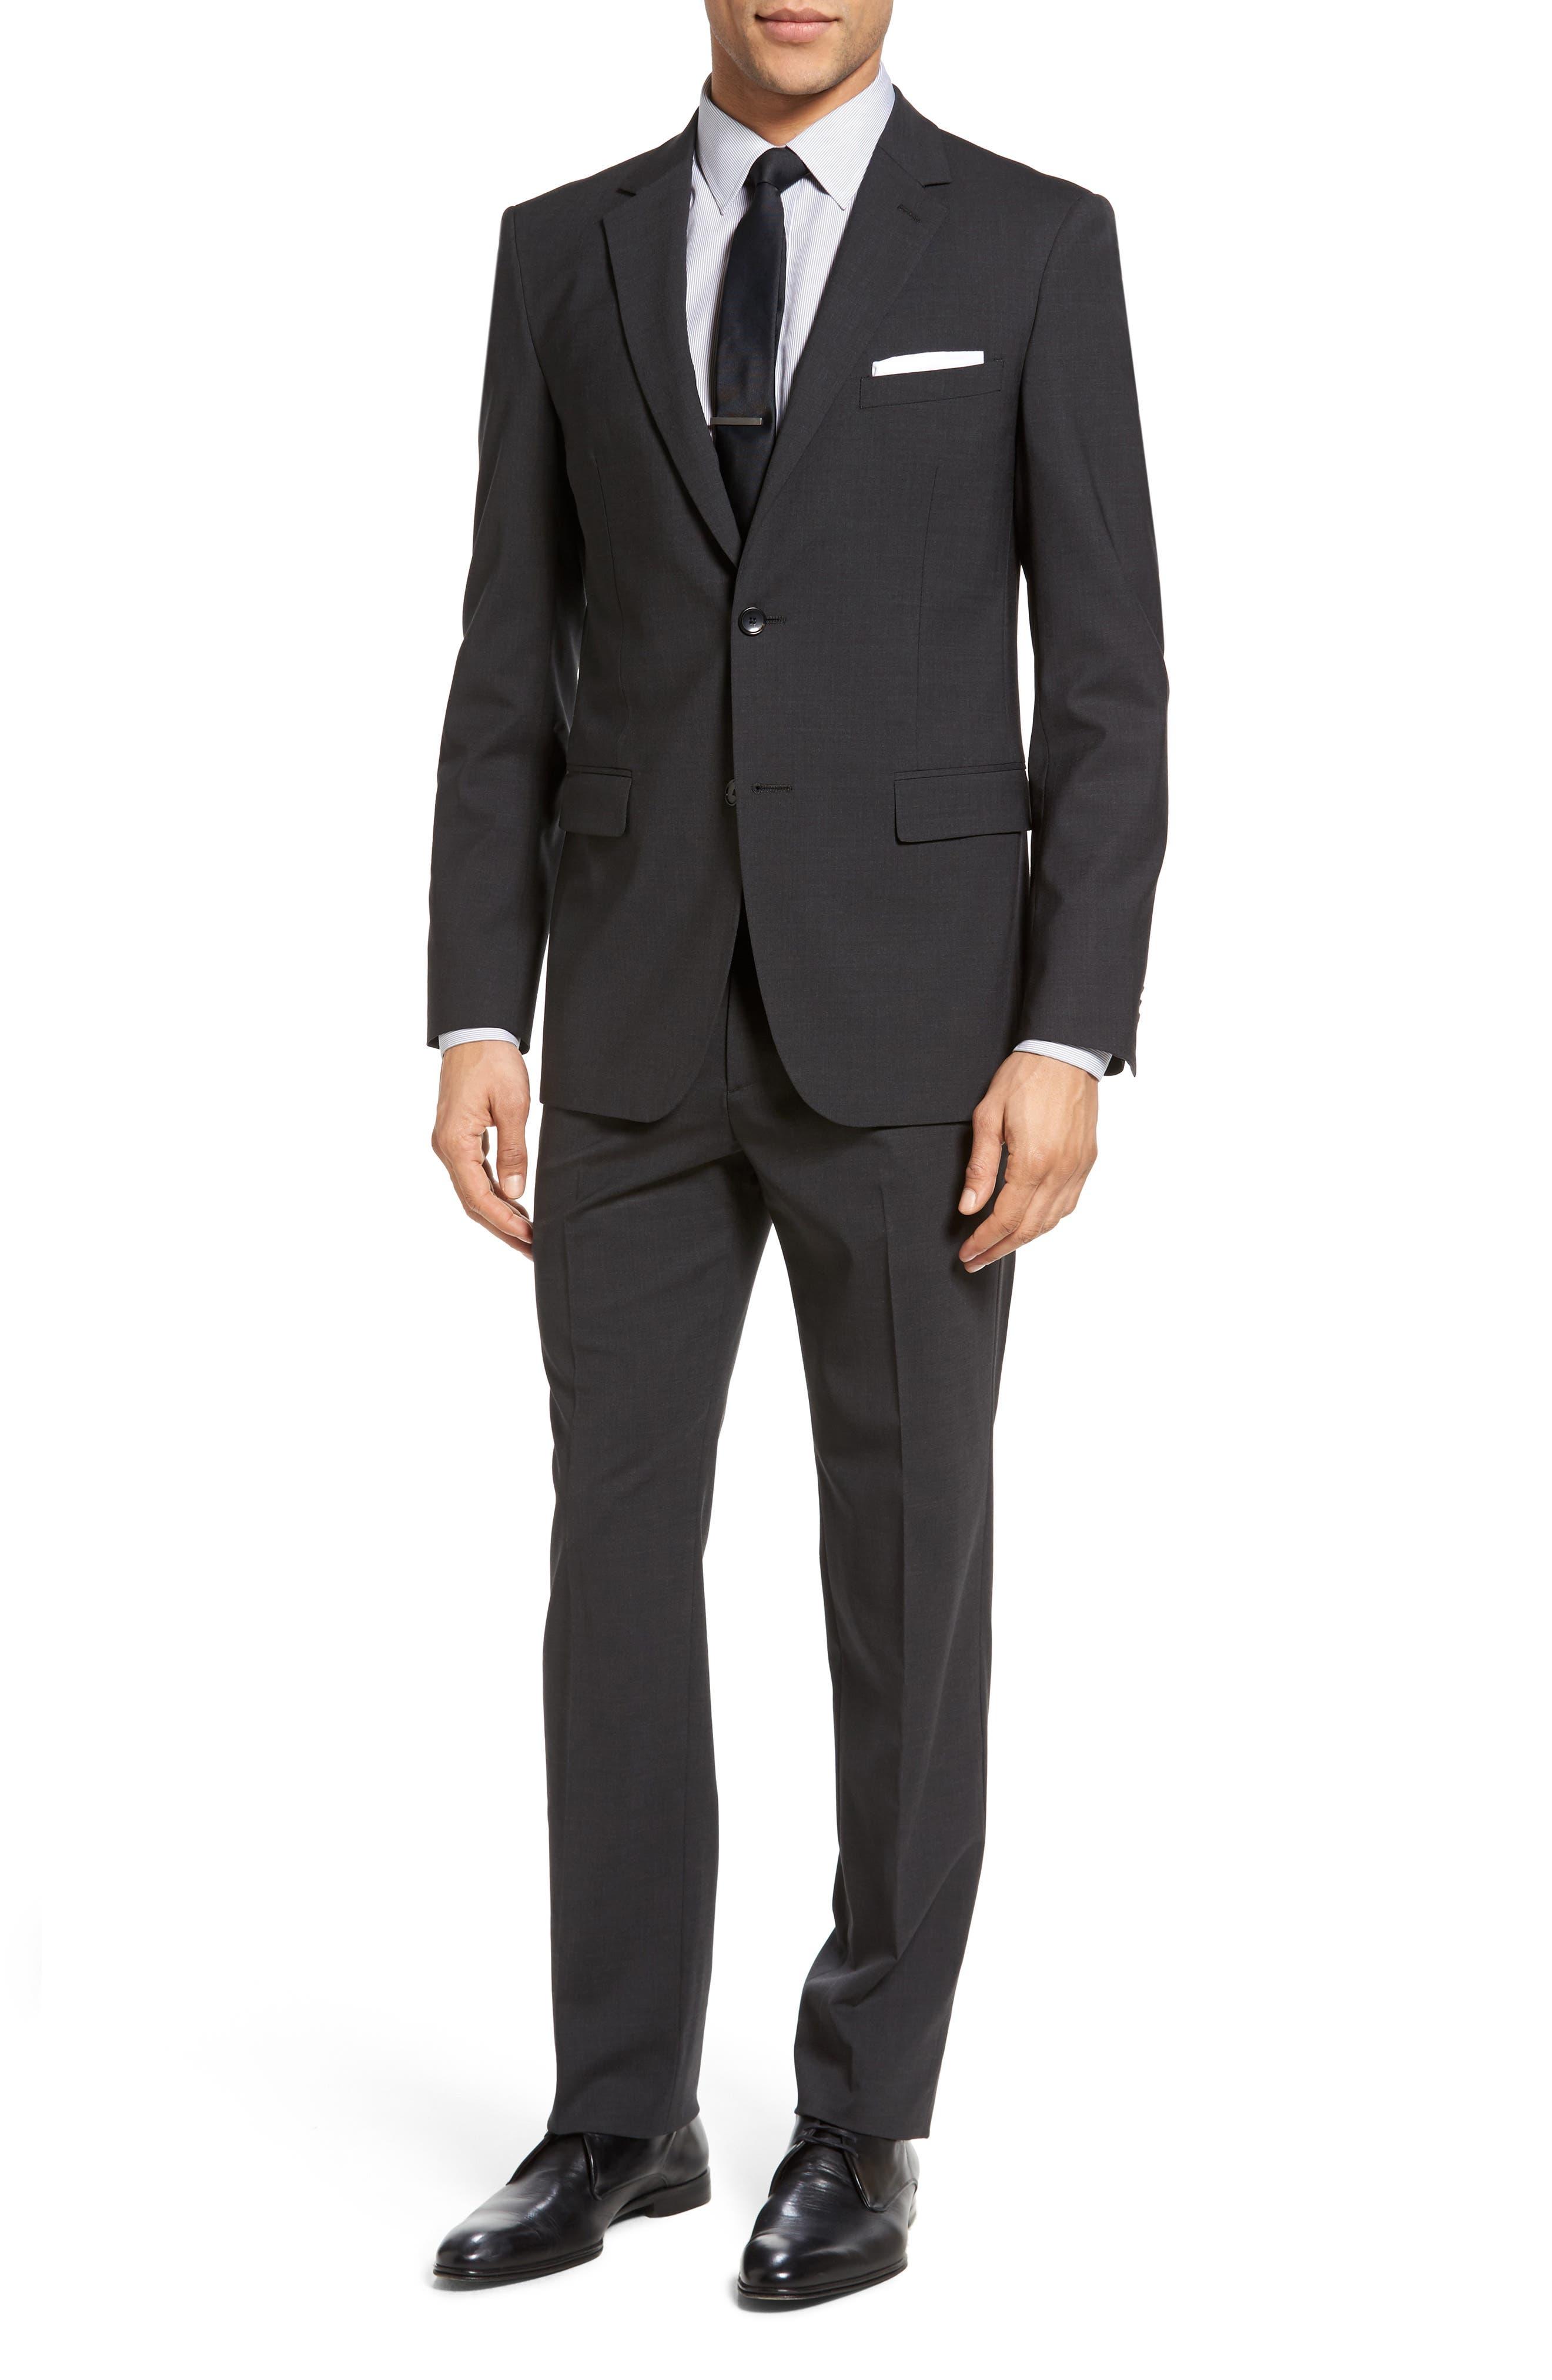 Wellar New Tailor 1 Trim Fit Stretch Wool Sport Coat,                             Alternate thumbnail 6, color,                             Dark Charcoal